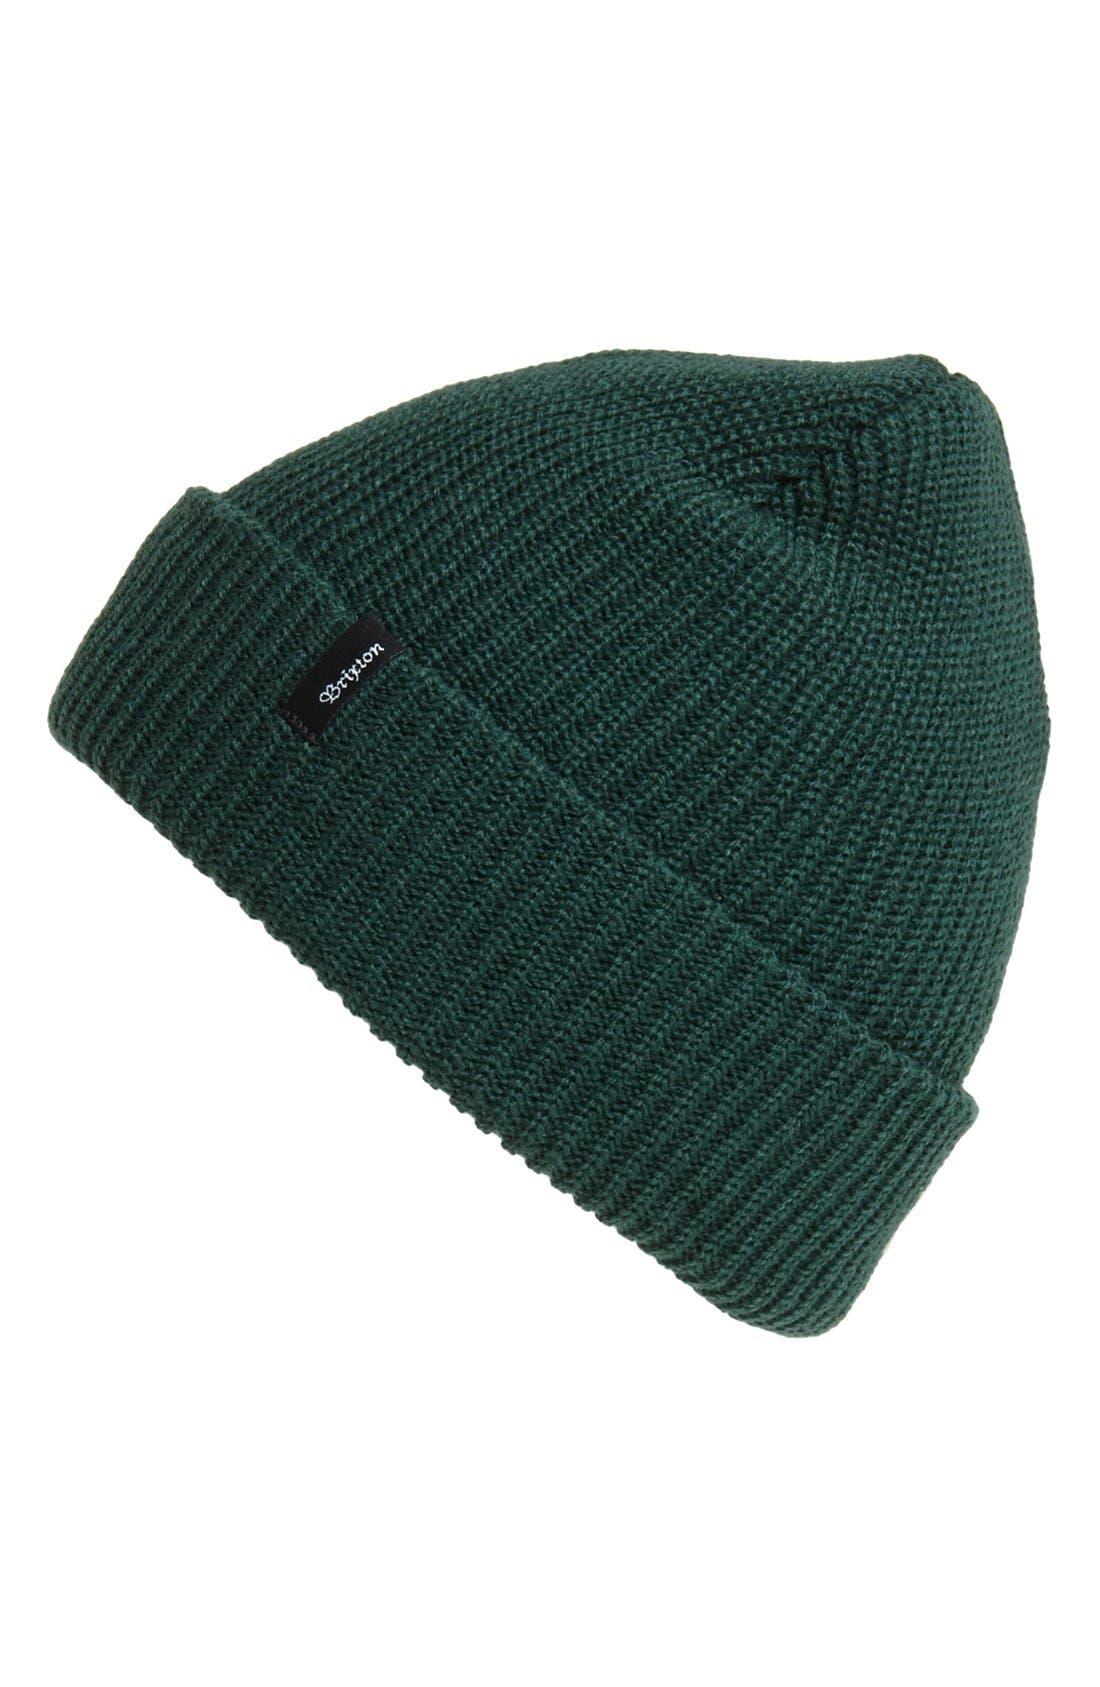 'Heist' Rib Knit Cap,                             Main thumbnail 7, color,